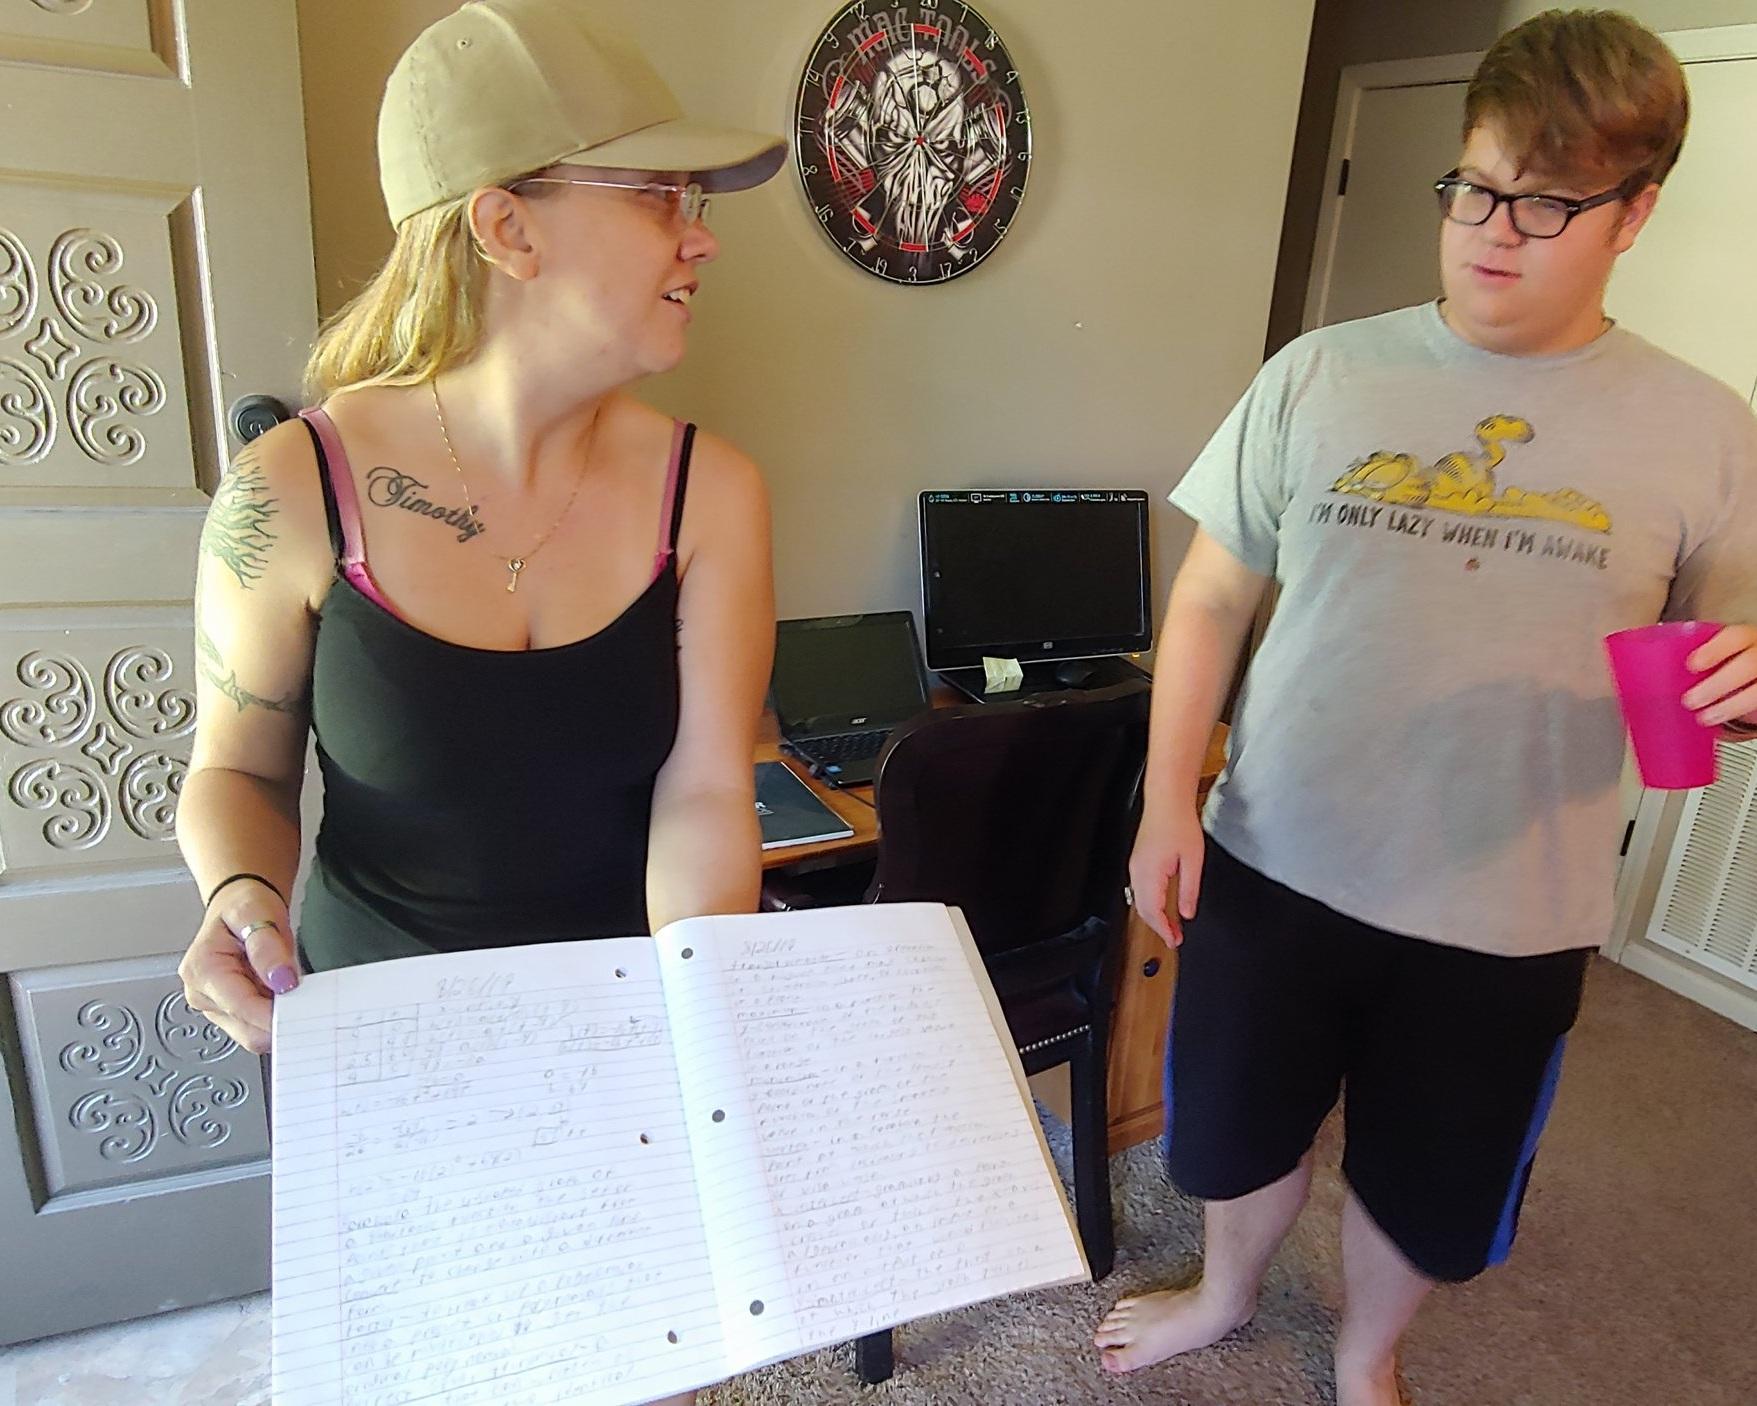 Kassie Argo looks over Adam's work in their Independence home